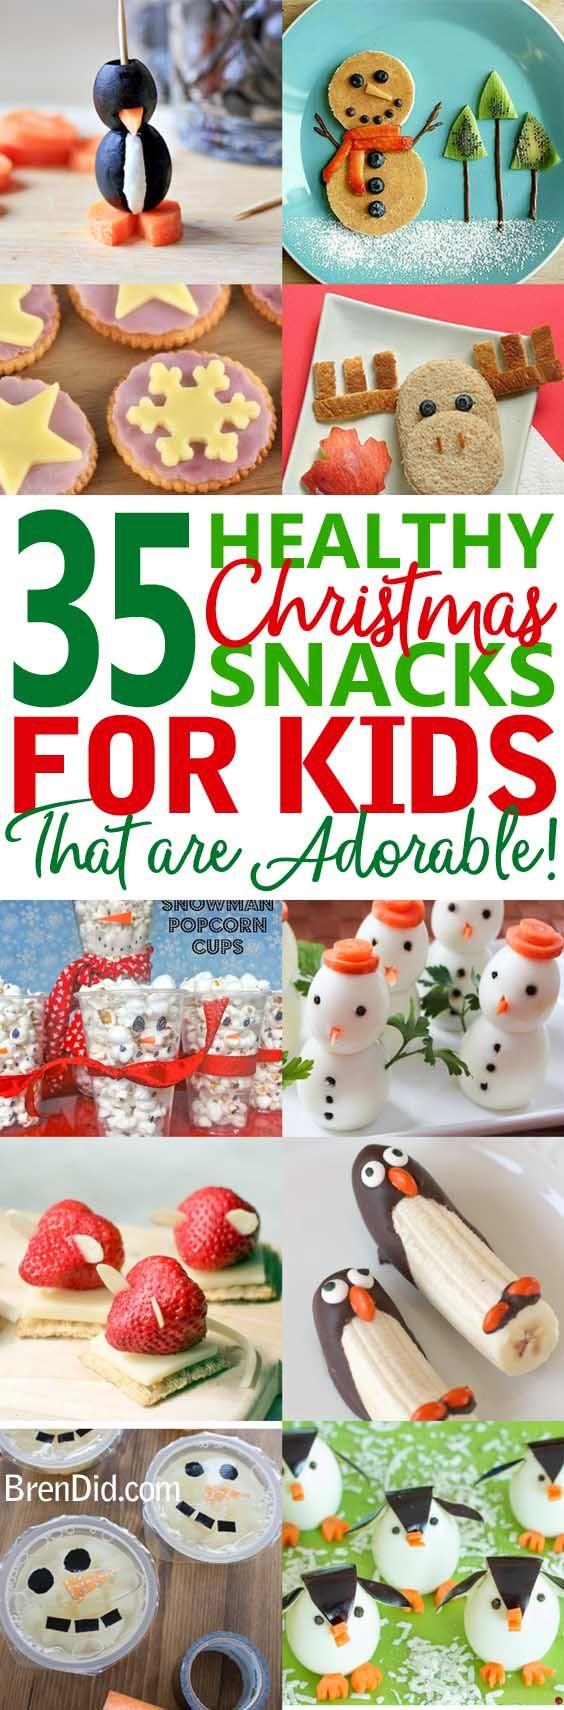 Healthy Christmas Treats for Kids | Pinterest | Snacks, Weihnachten ...